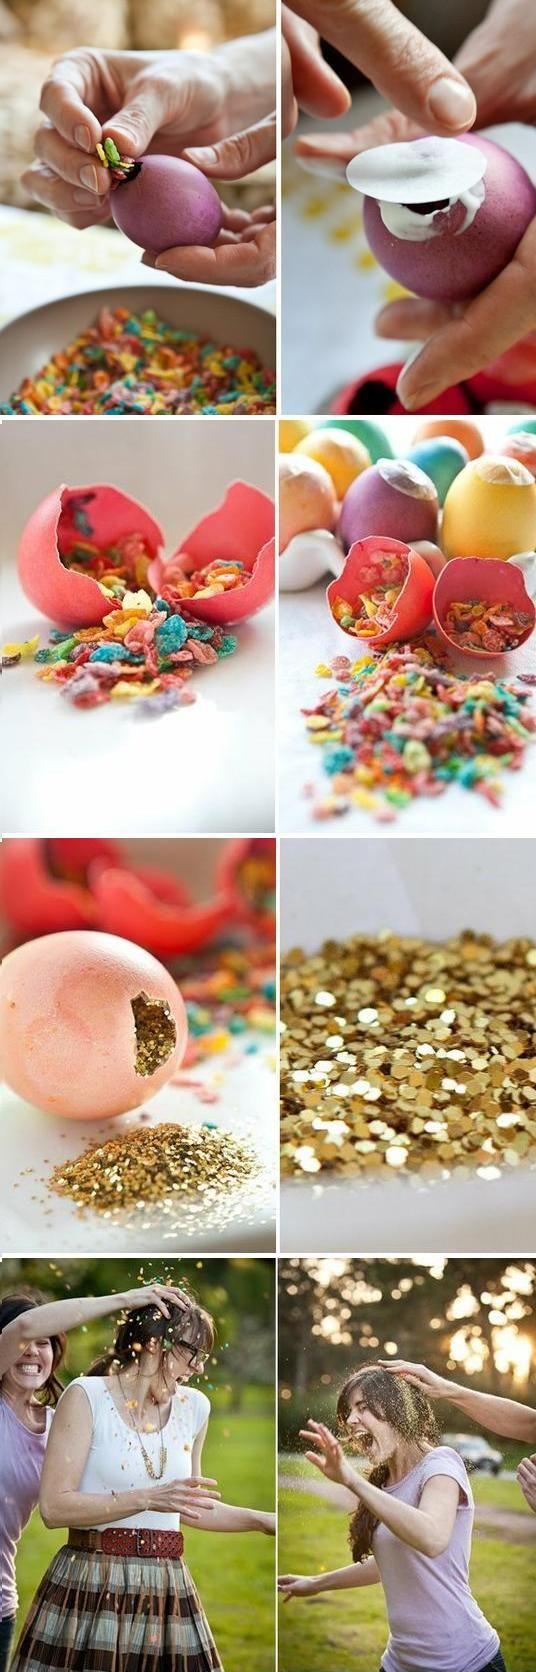 egg confetti pretty genius! DIY crafts party fun